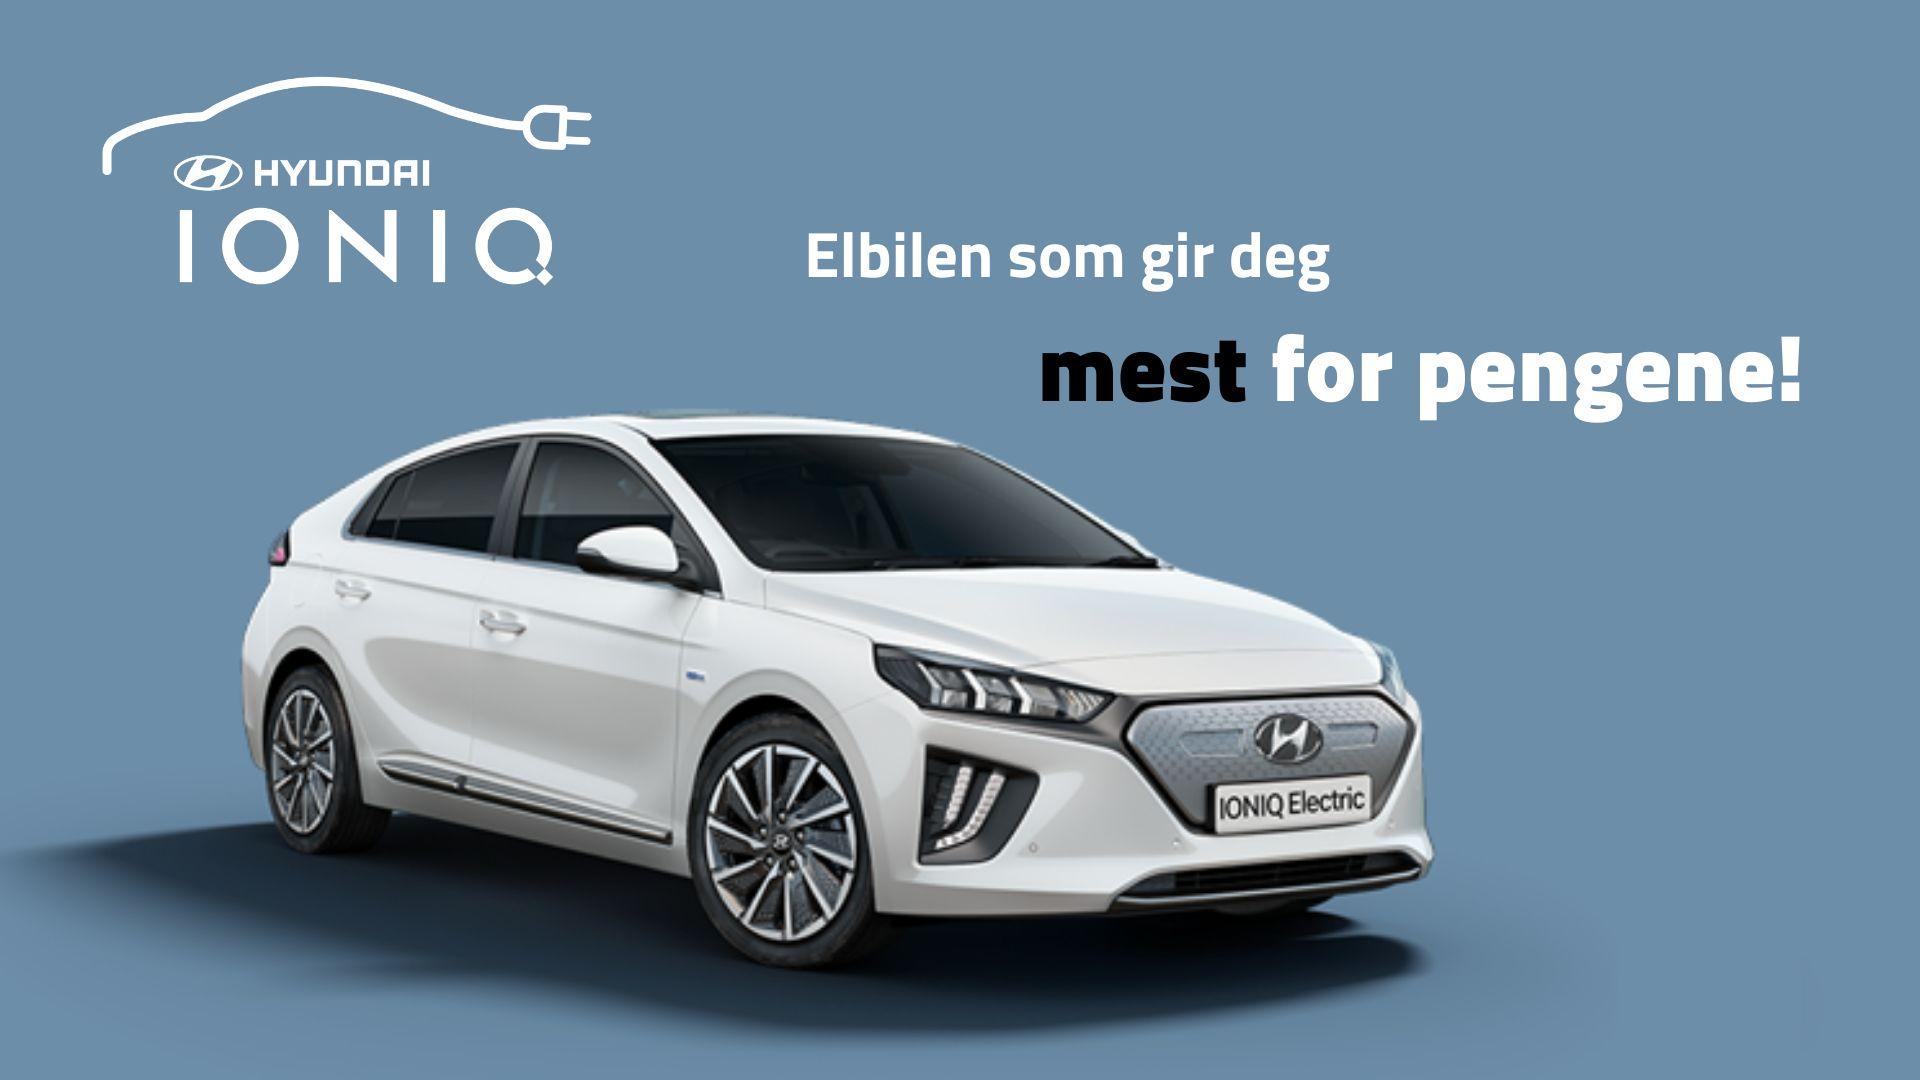 Hyundai IONIQ Electric 32% lengre rekkevidde   Hyundai